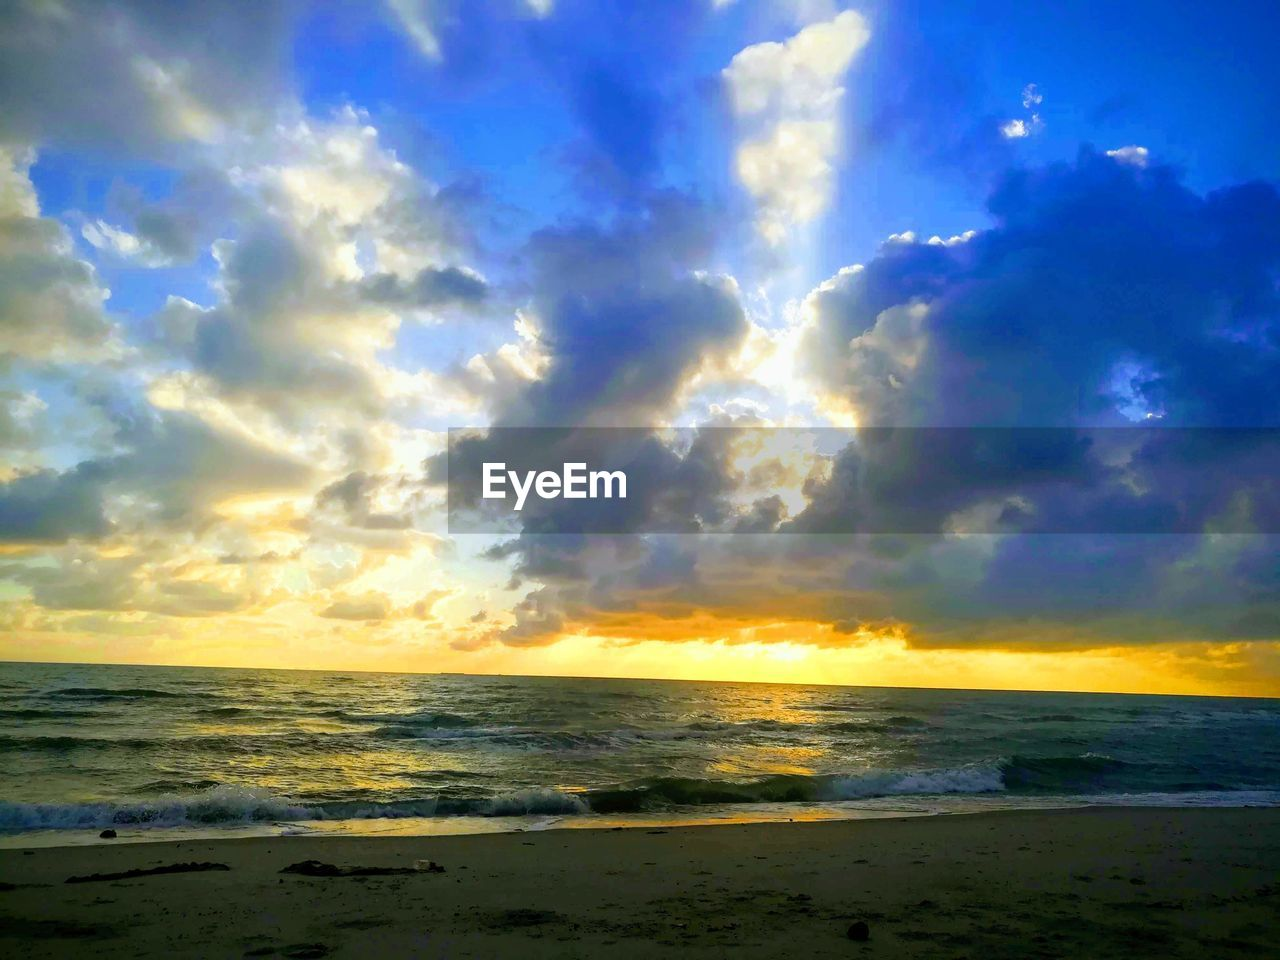 sky, cloud - sky, sea, water, beauty in nature, scenics - nature, horizon, horizon over water, tranquility, tranquil scene, beach, land, sunset, nature, no people, idyllic, outdoors, non-urban scene, wave